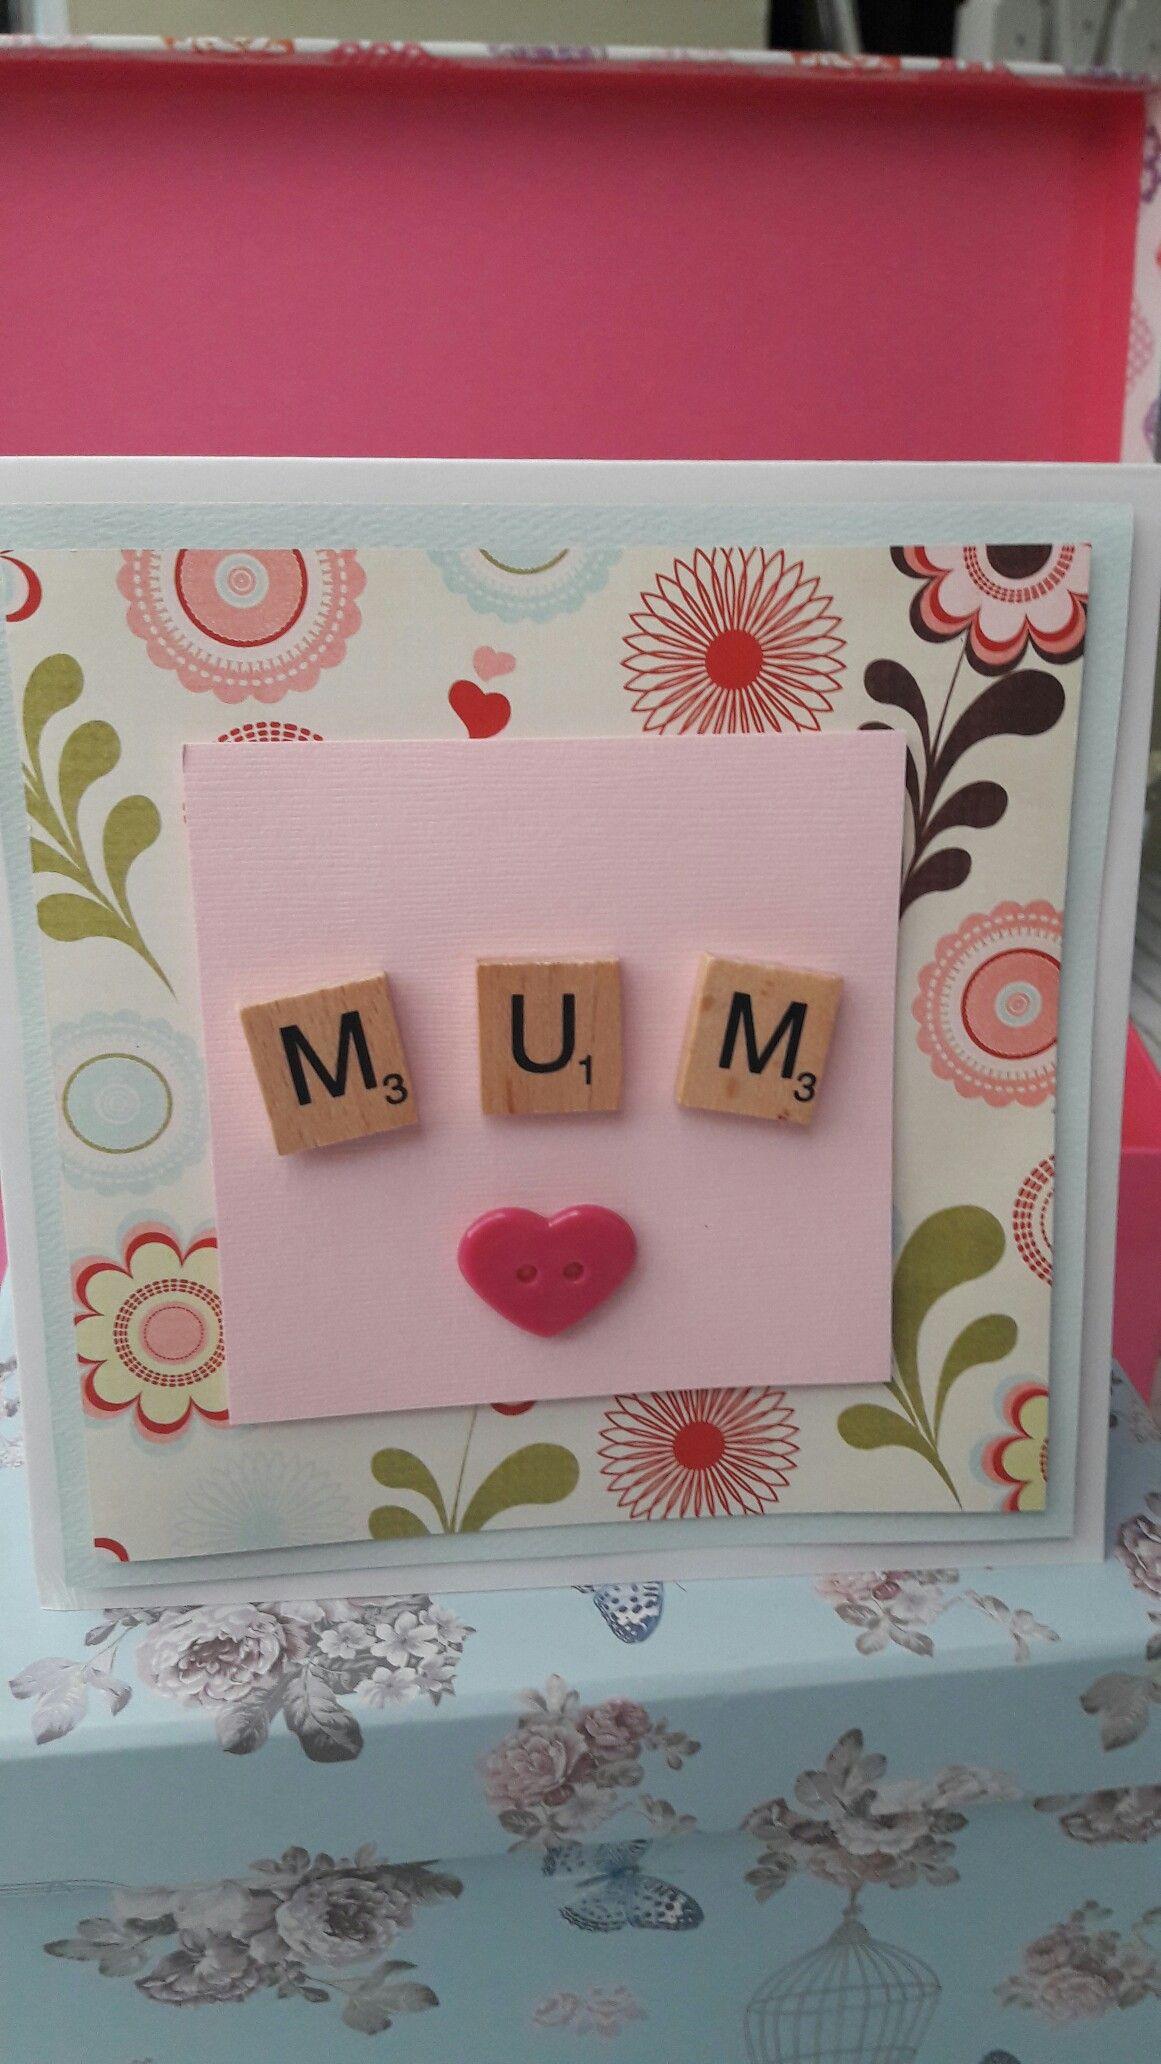 Scrabble mum birthday/mother's day card